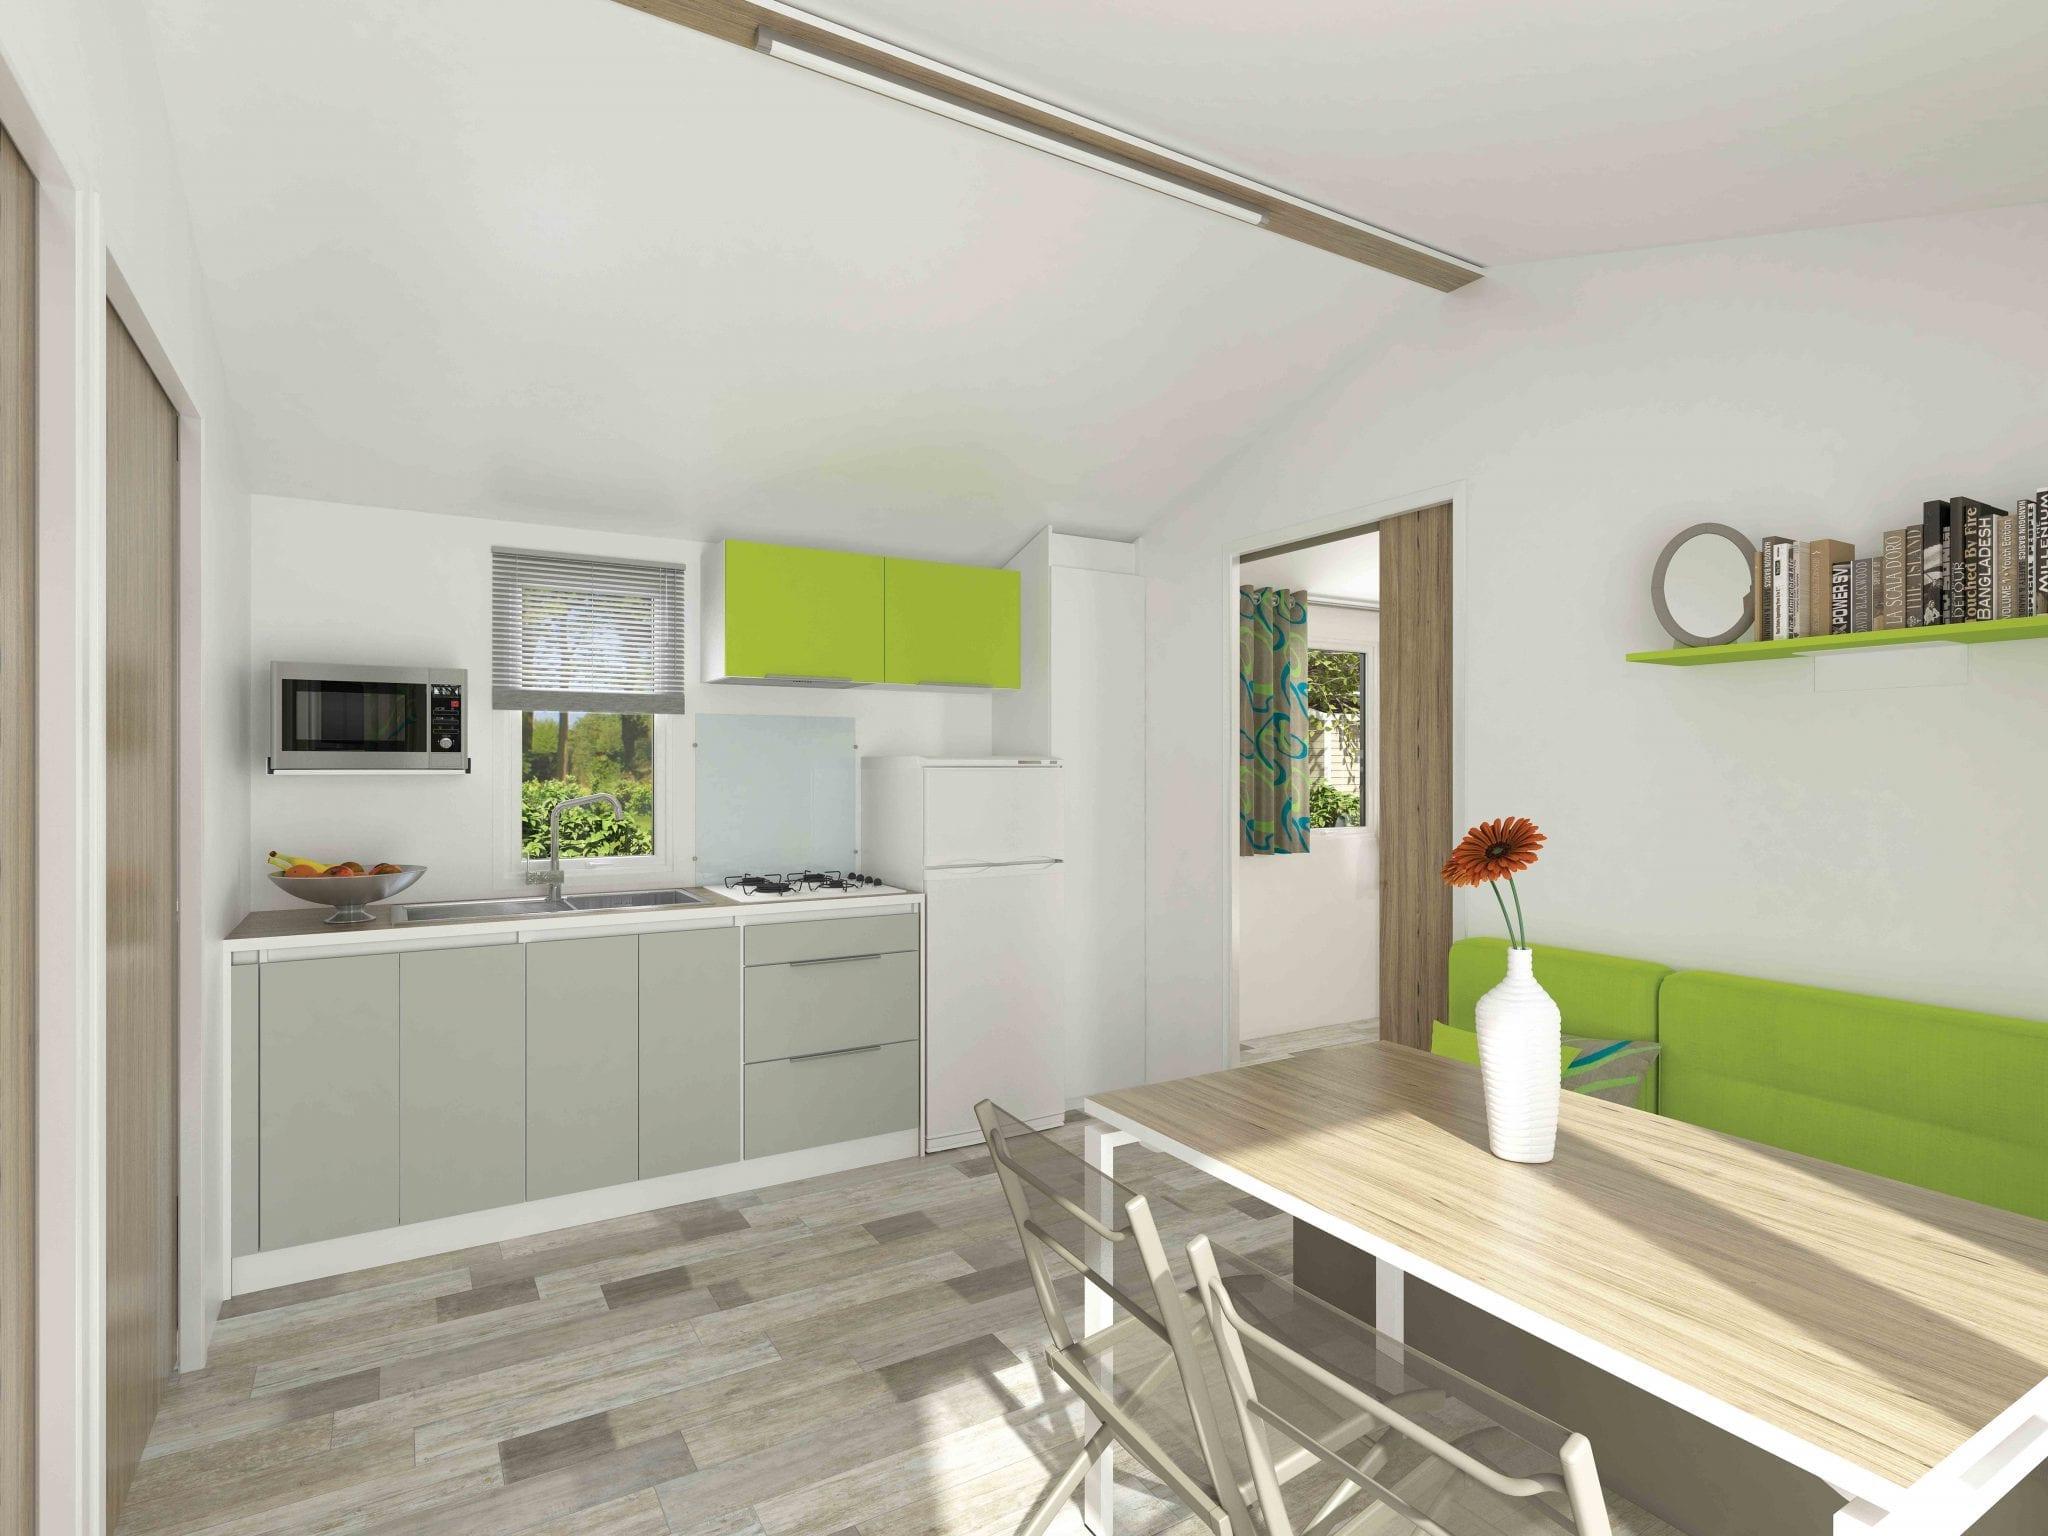 ridorev ibiza duo adapt pmr mobil home neuf gamme essentiels zen mobil homes. Black Bedroom Furniture Sets. Home Design Ideas